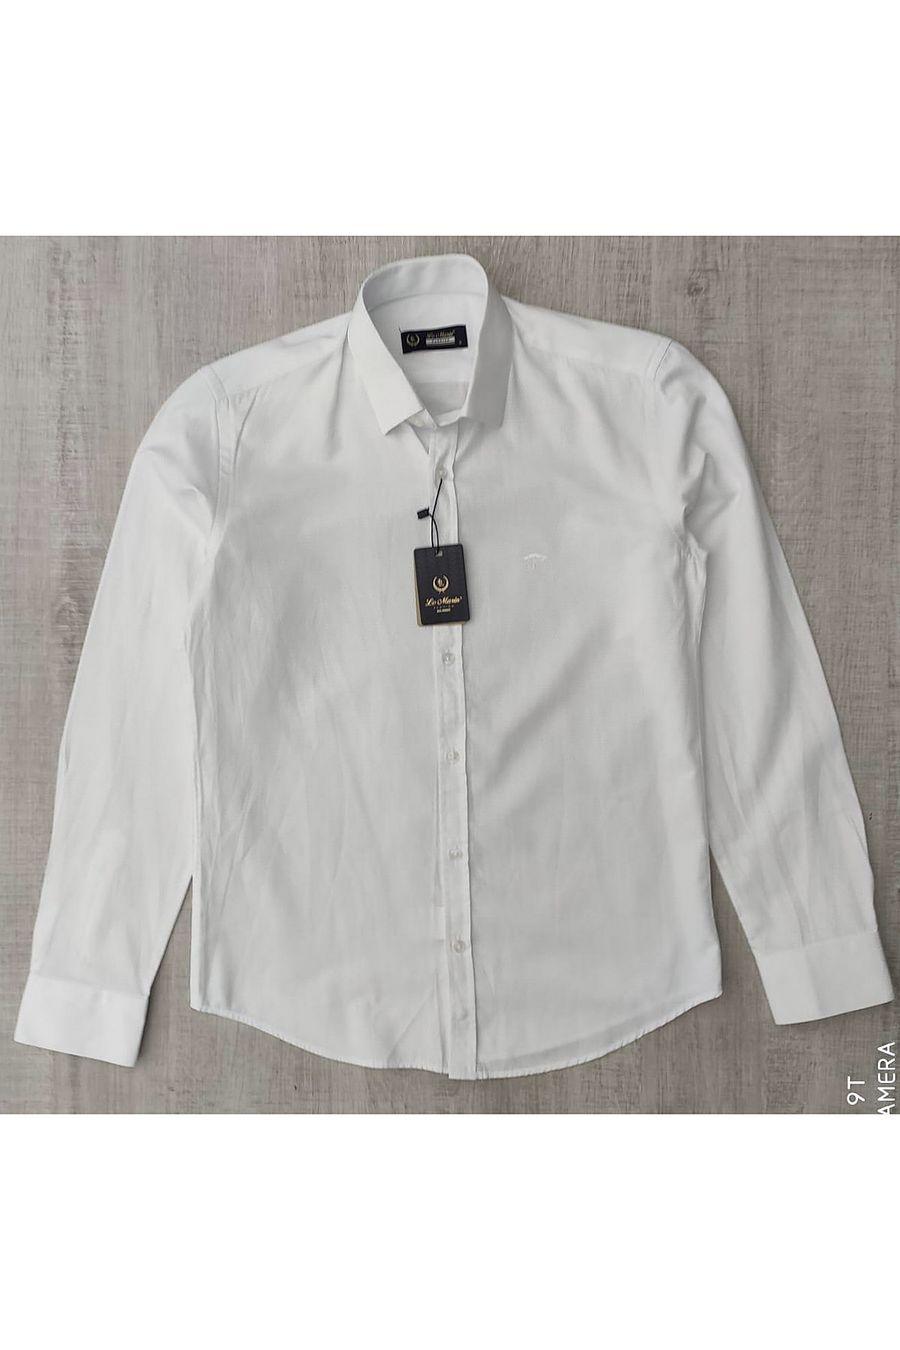 Рубашка мужская Le Marin 305-3 - фото 1